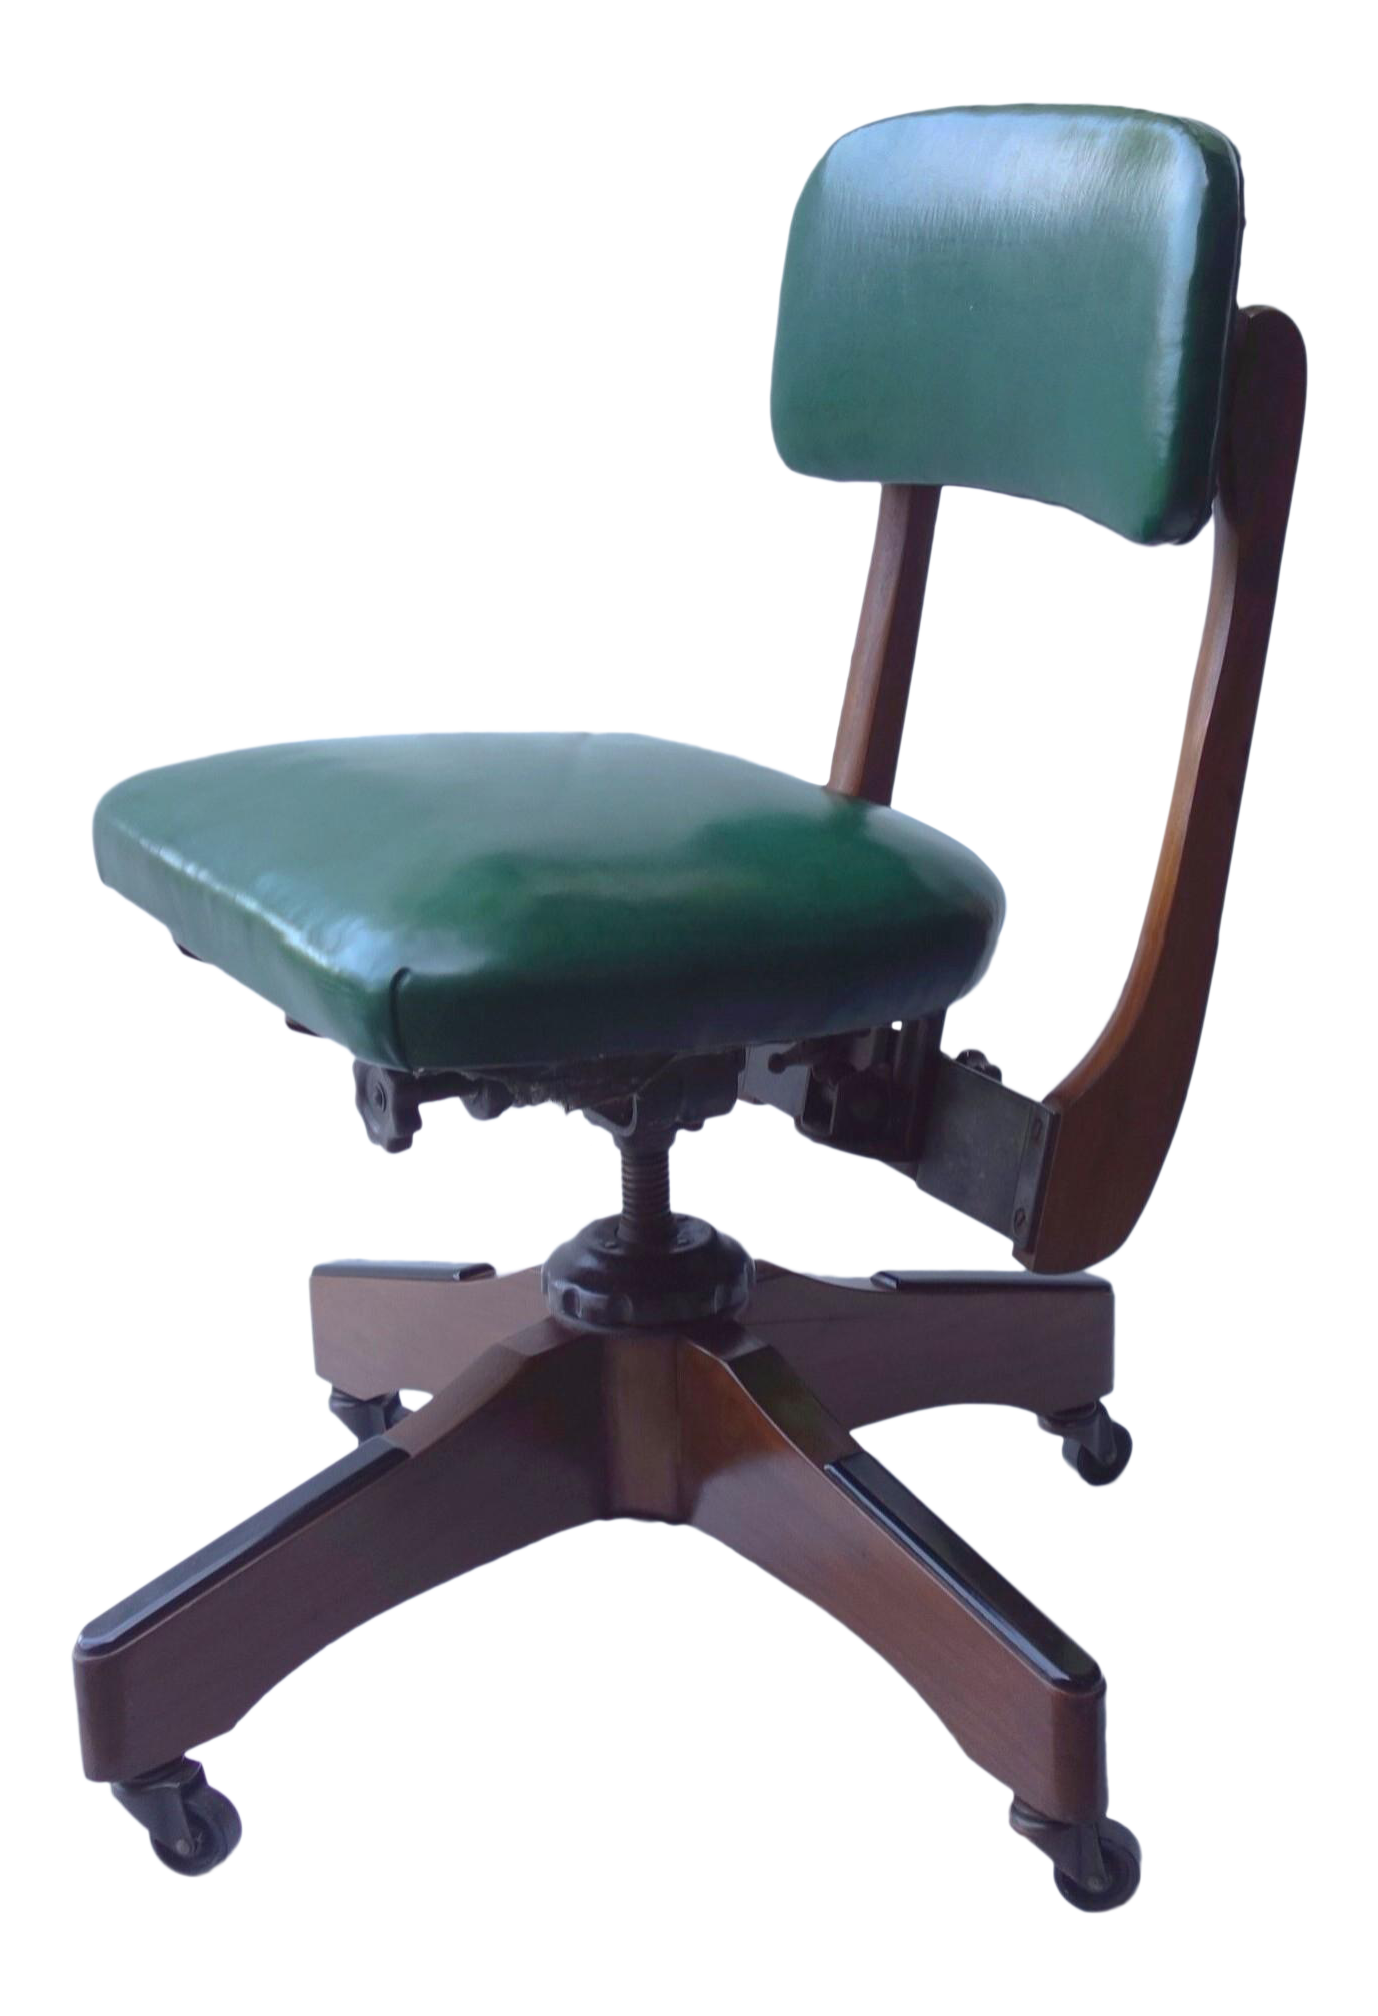 1950s Vintage Gunlocke Walnut Wood fice Chair